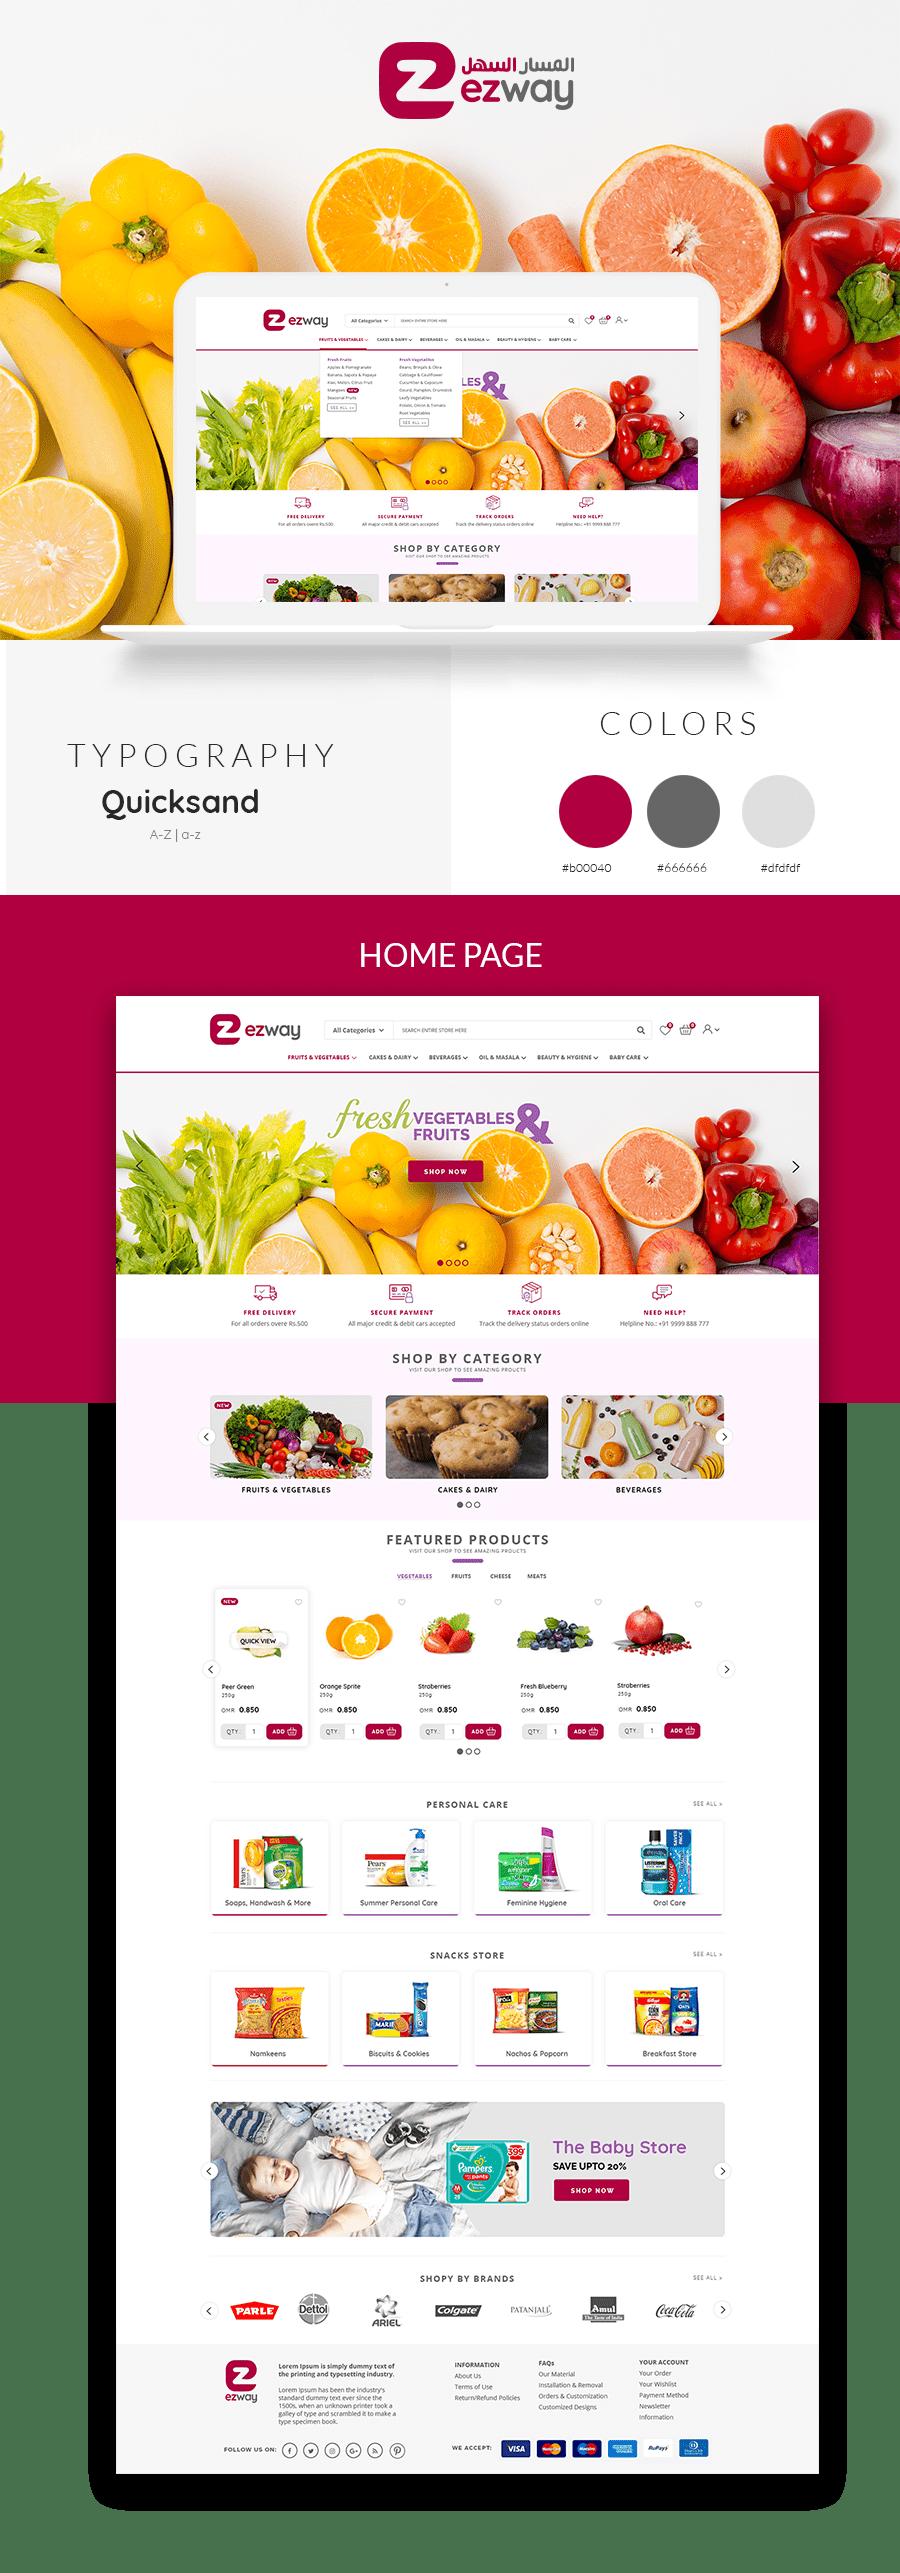 Image may contain: screenshot, fruit and food